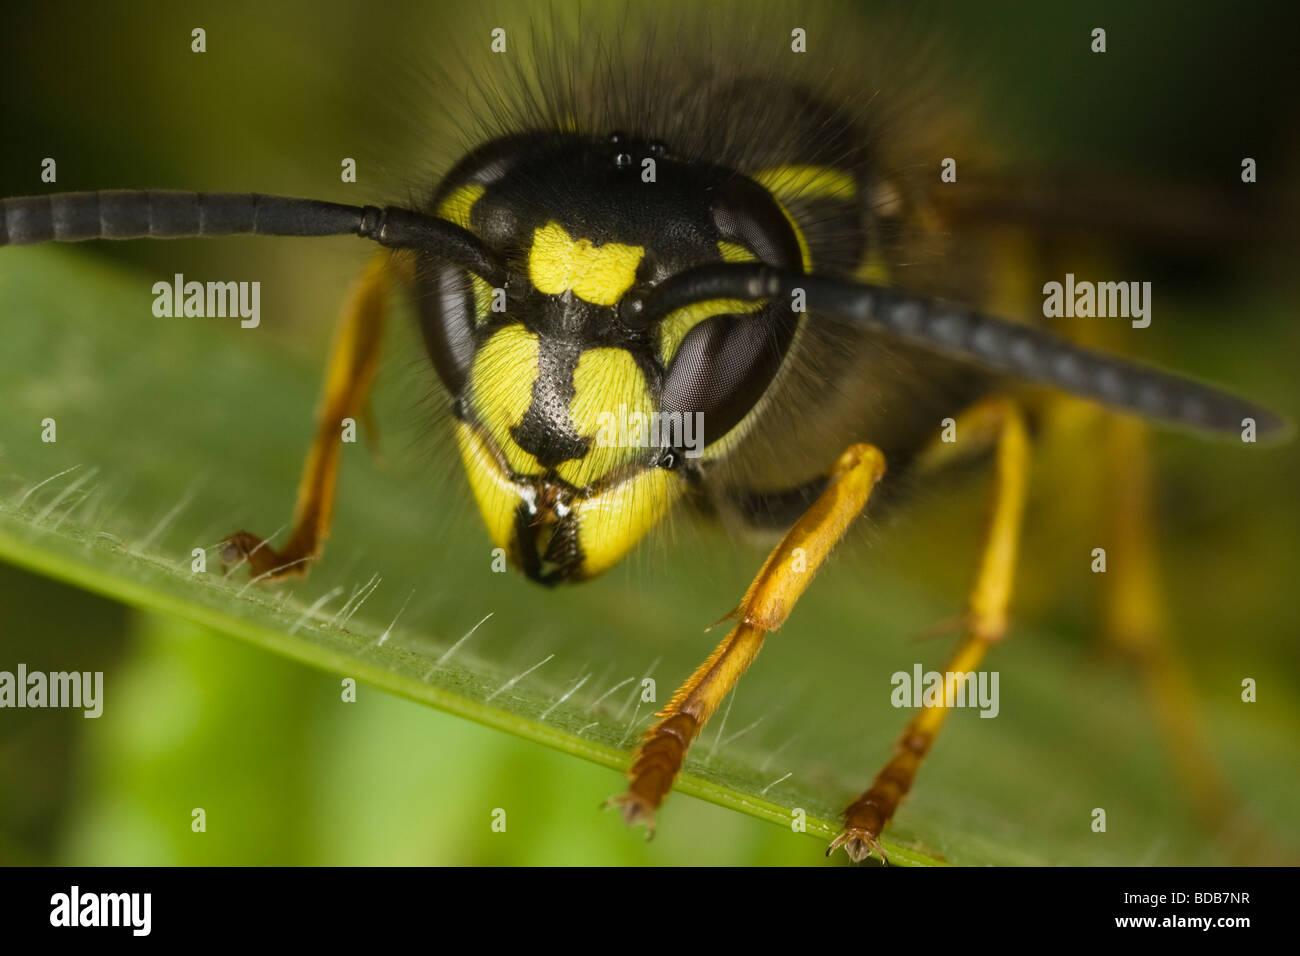 macro close-up of a Common Wasp (Vespula vulgaris) head Stock Photo